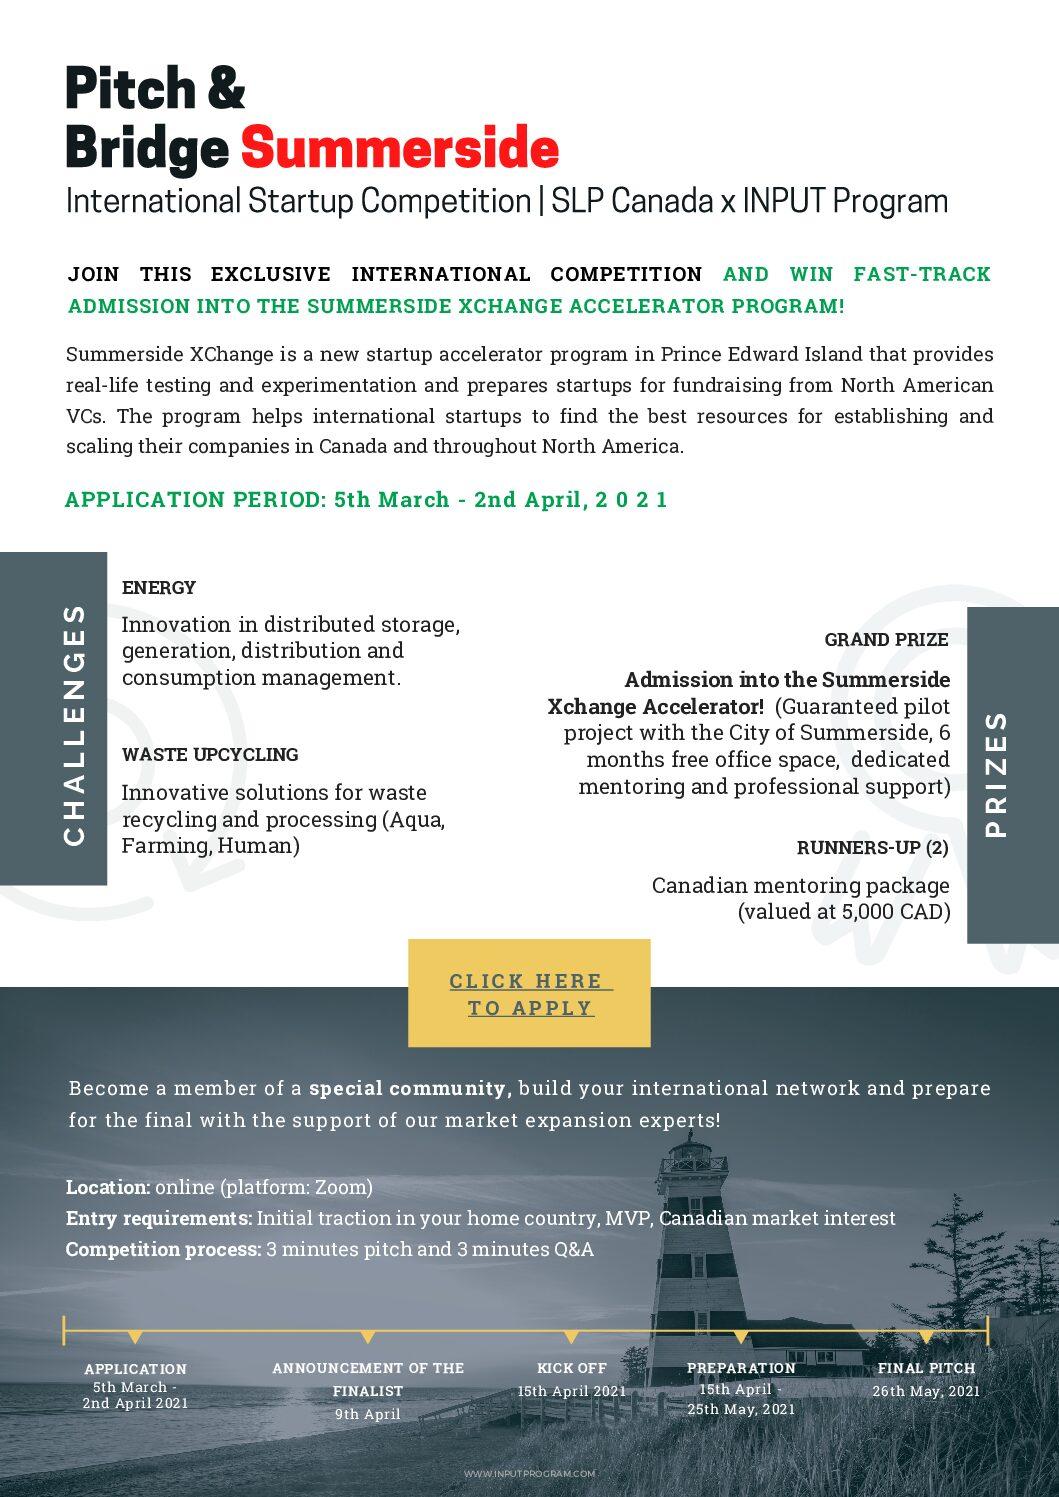 , Pitch & Bridge Summerside: International Startup Competition | SLP Canada x INPUT Program